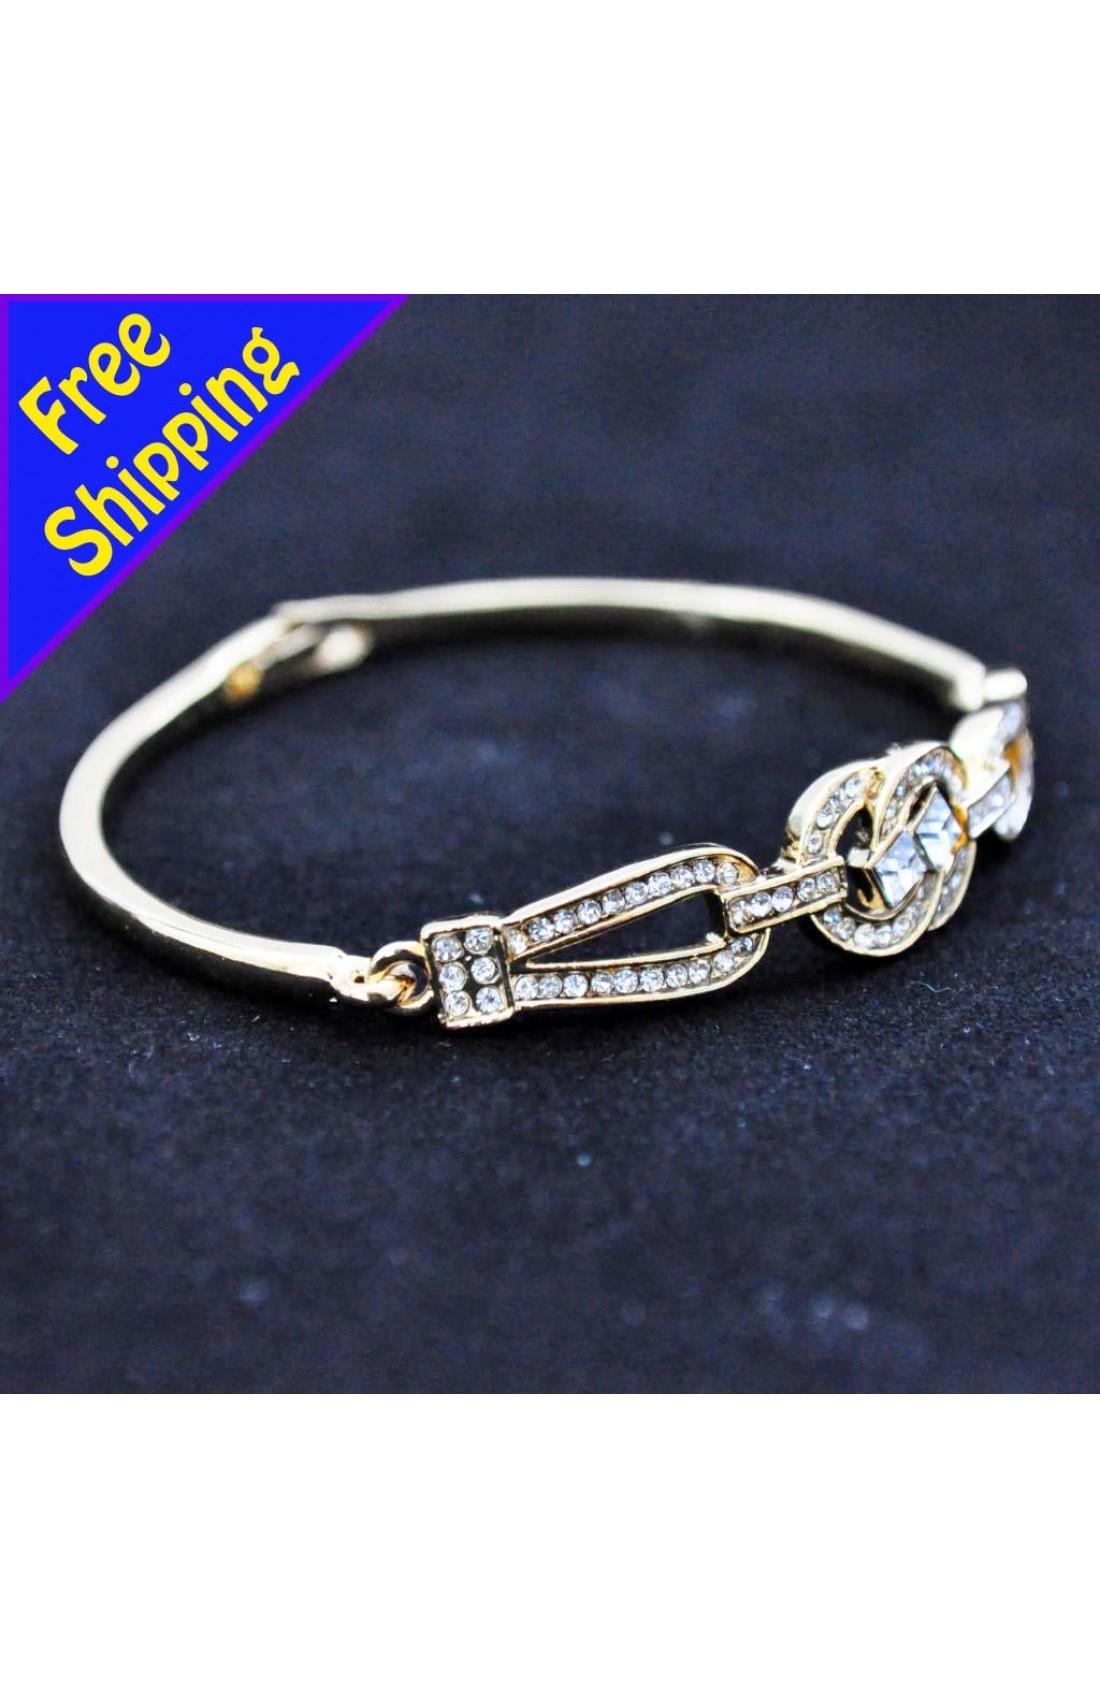 14K Gold Plated with high quality Zircon Daisy Chain Stylish bangle bracelet